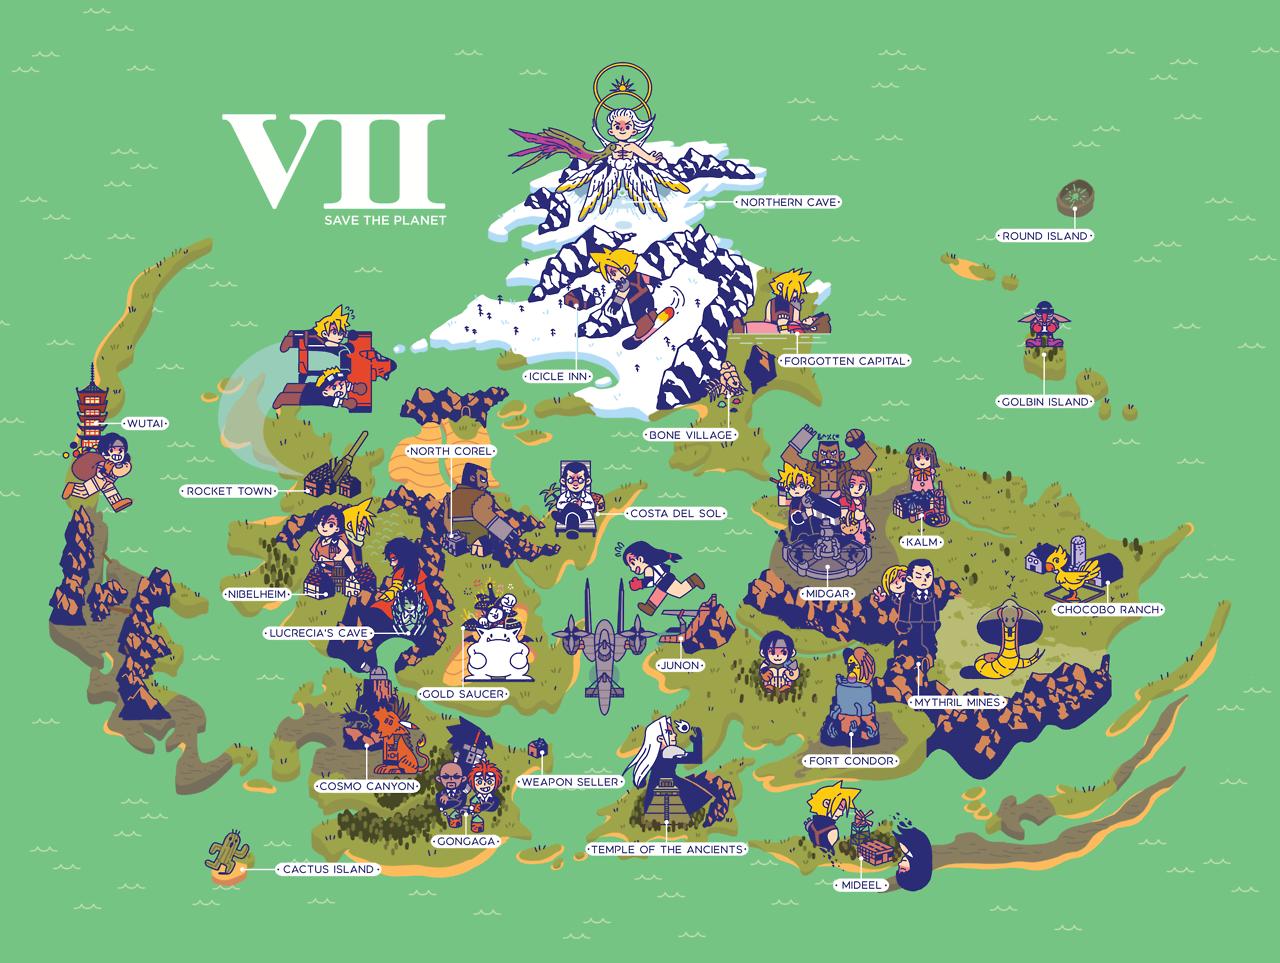 FF7 map